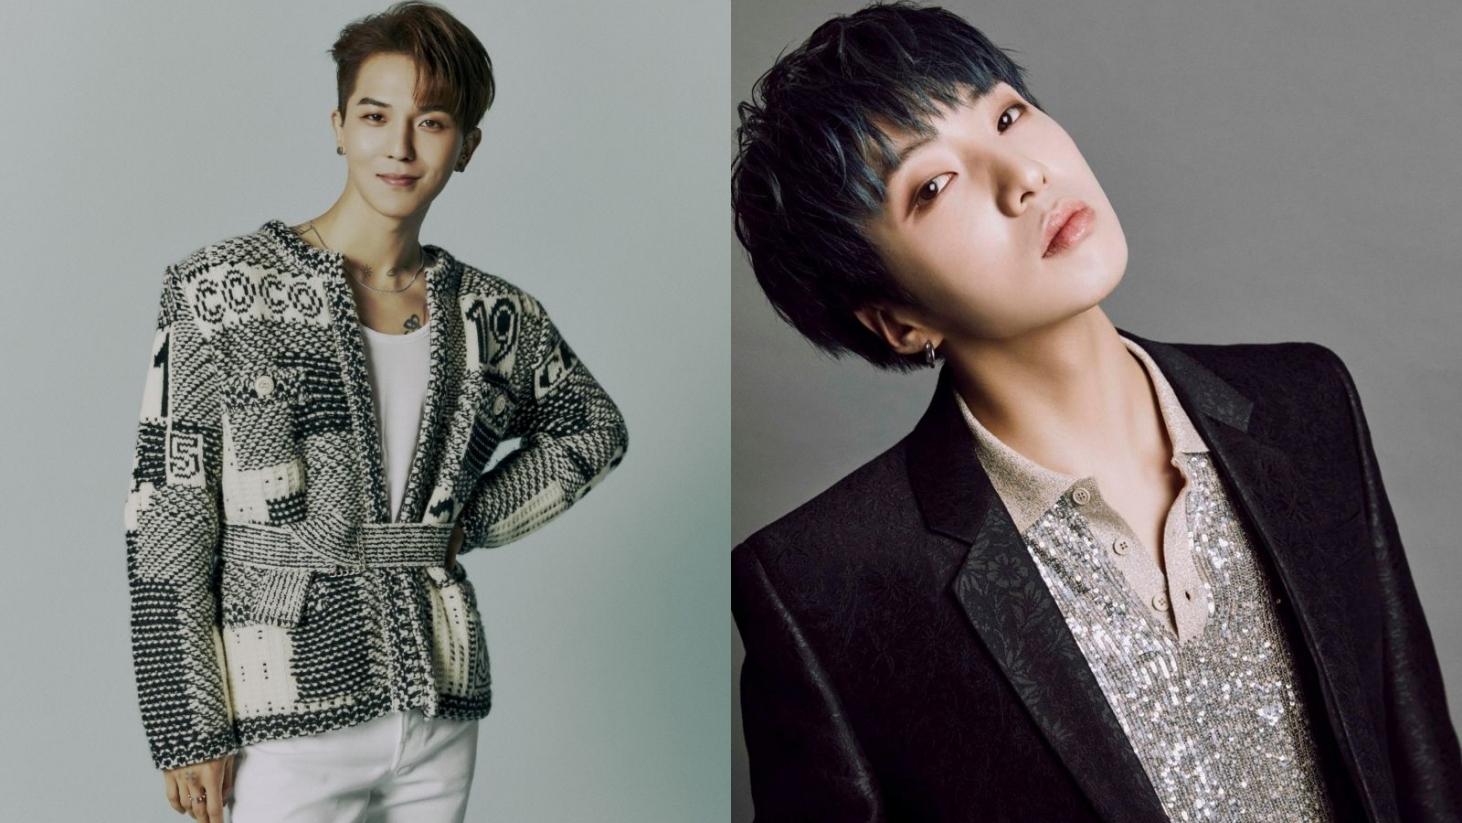 YG Entertainment Confirms The Solo Comeback Plan of WINNER's Mino and Kang Seung Yoon